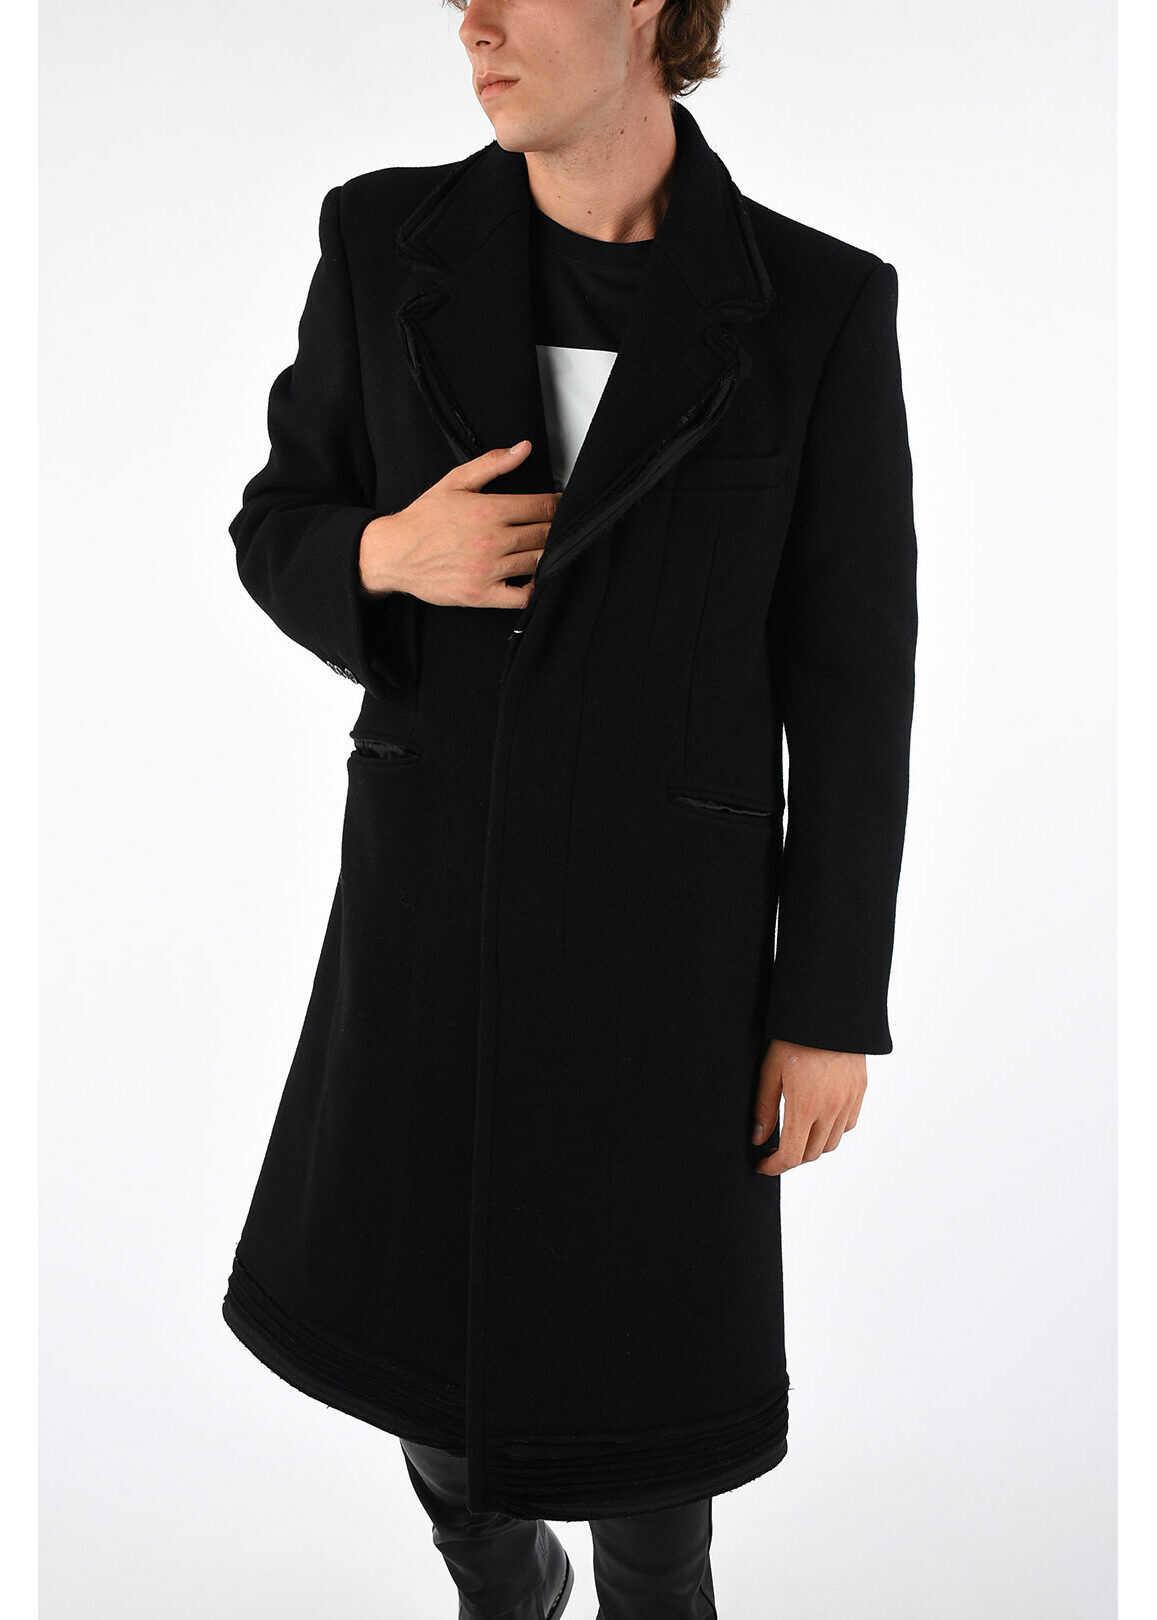 Maison Margiela MM10 Wool Virgin Coat BLACK